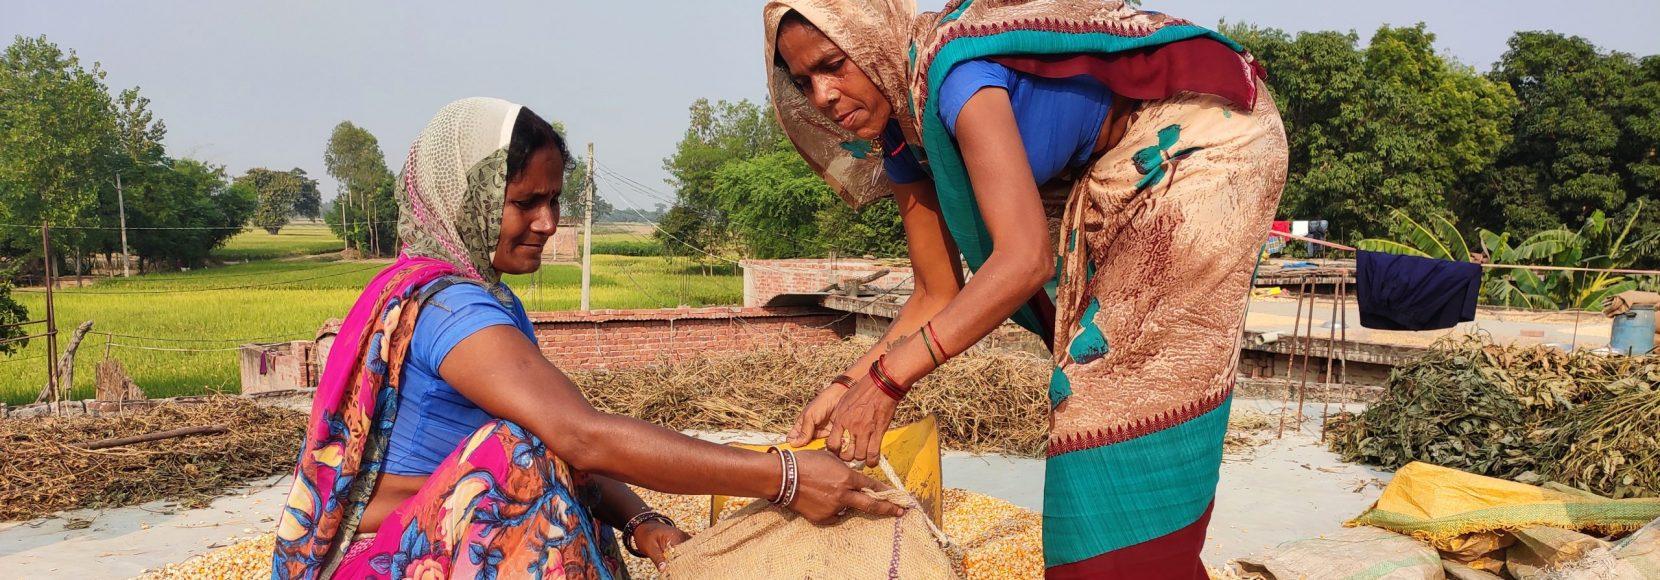 women who lead -Maize procurement in Uttar Pradesh, India